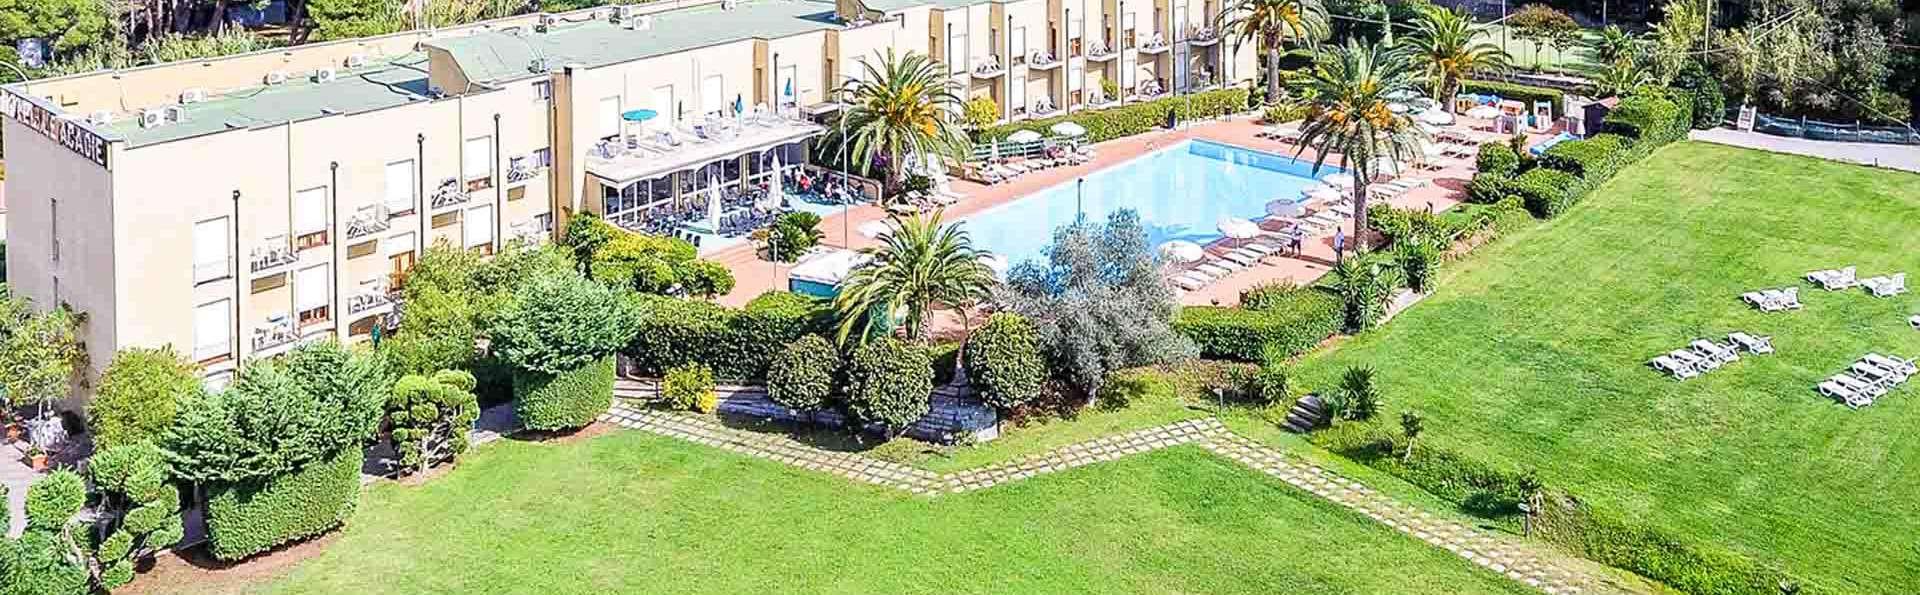 Hotel & Residence Le Acacie - EDIT_AERIAL_01.jpg